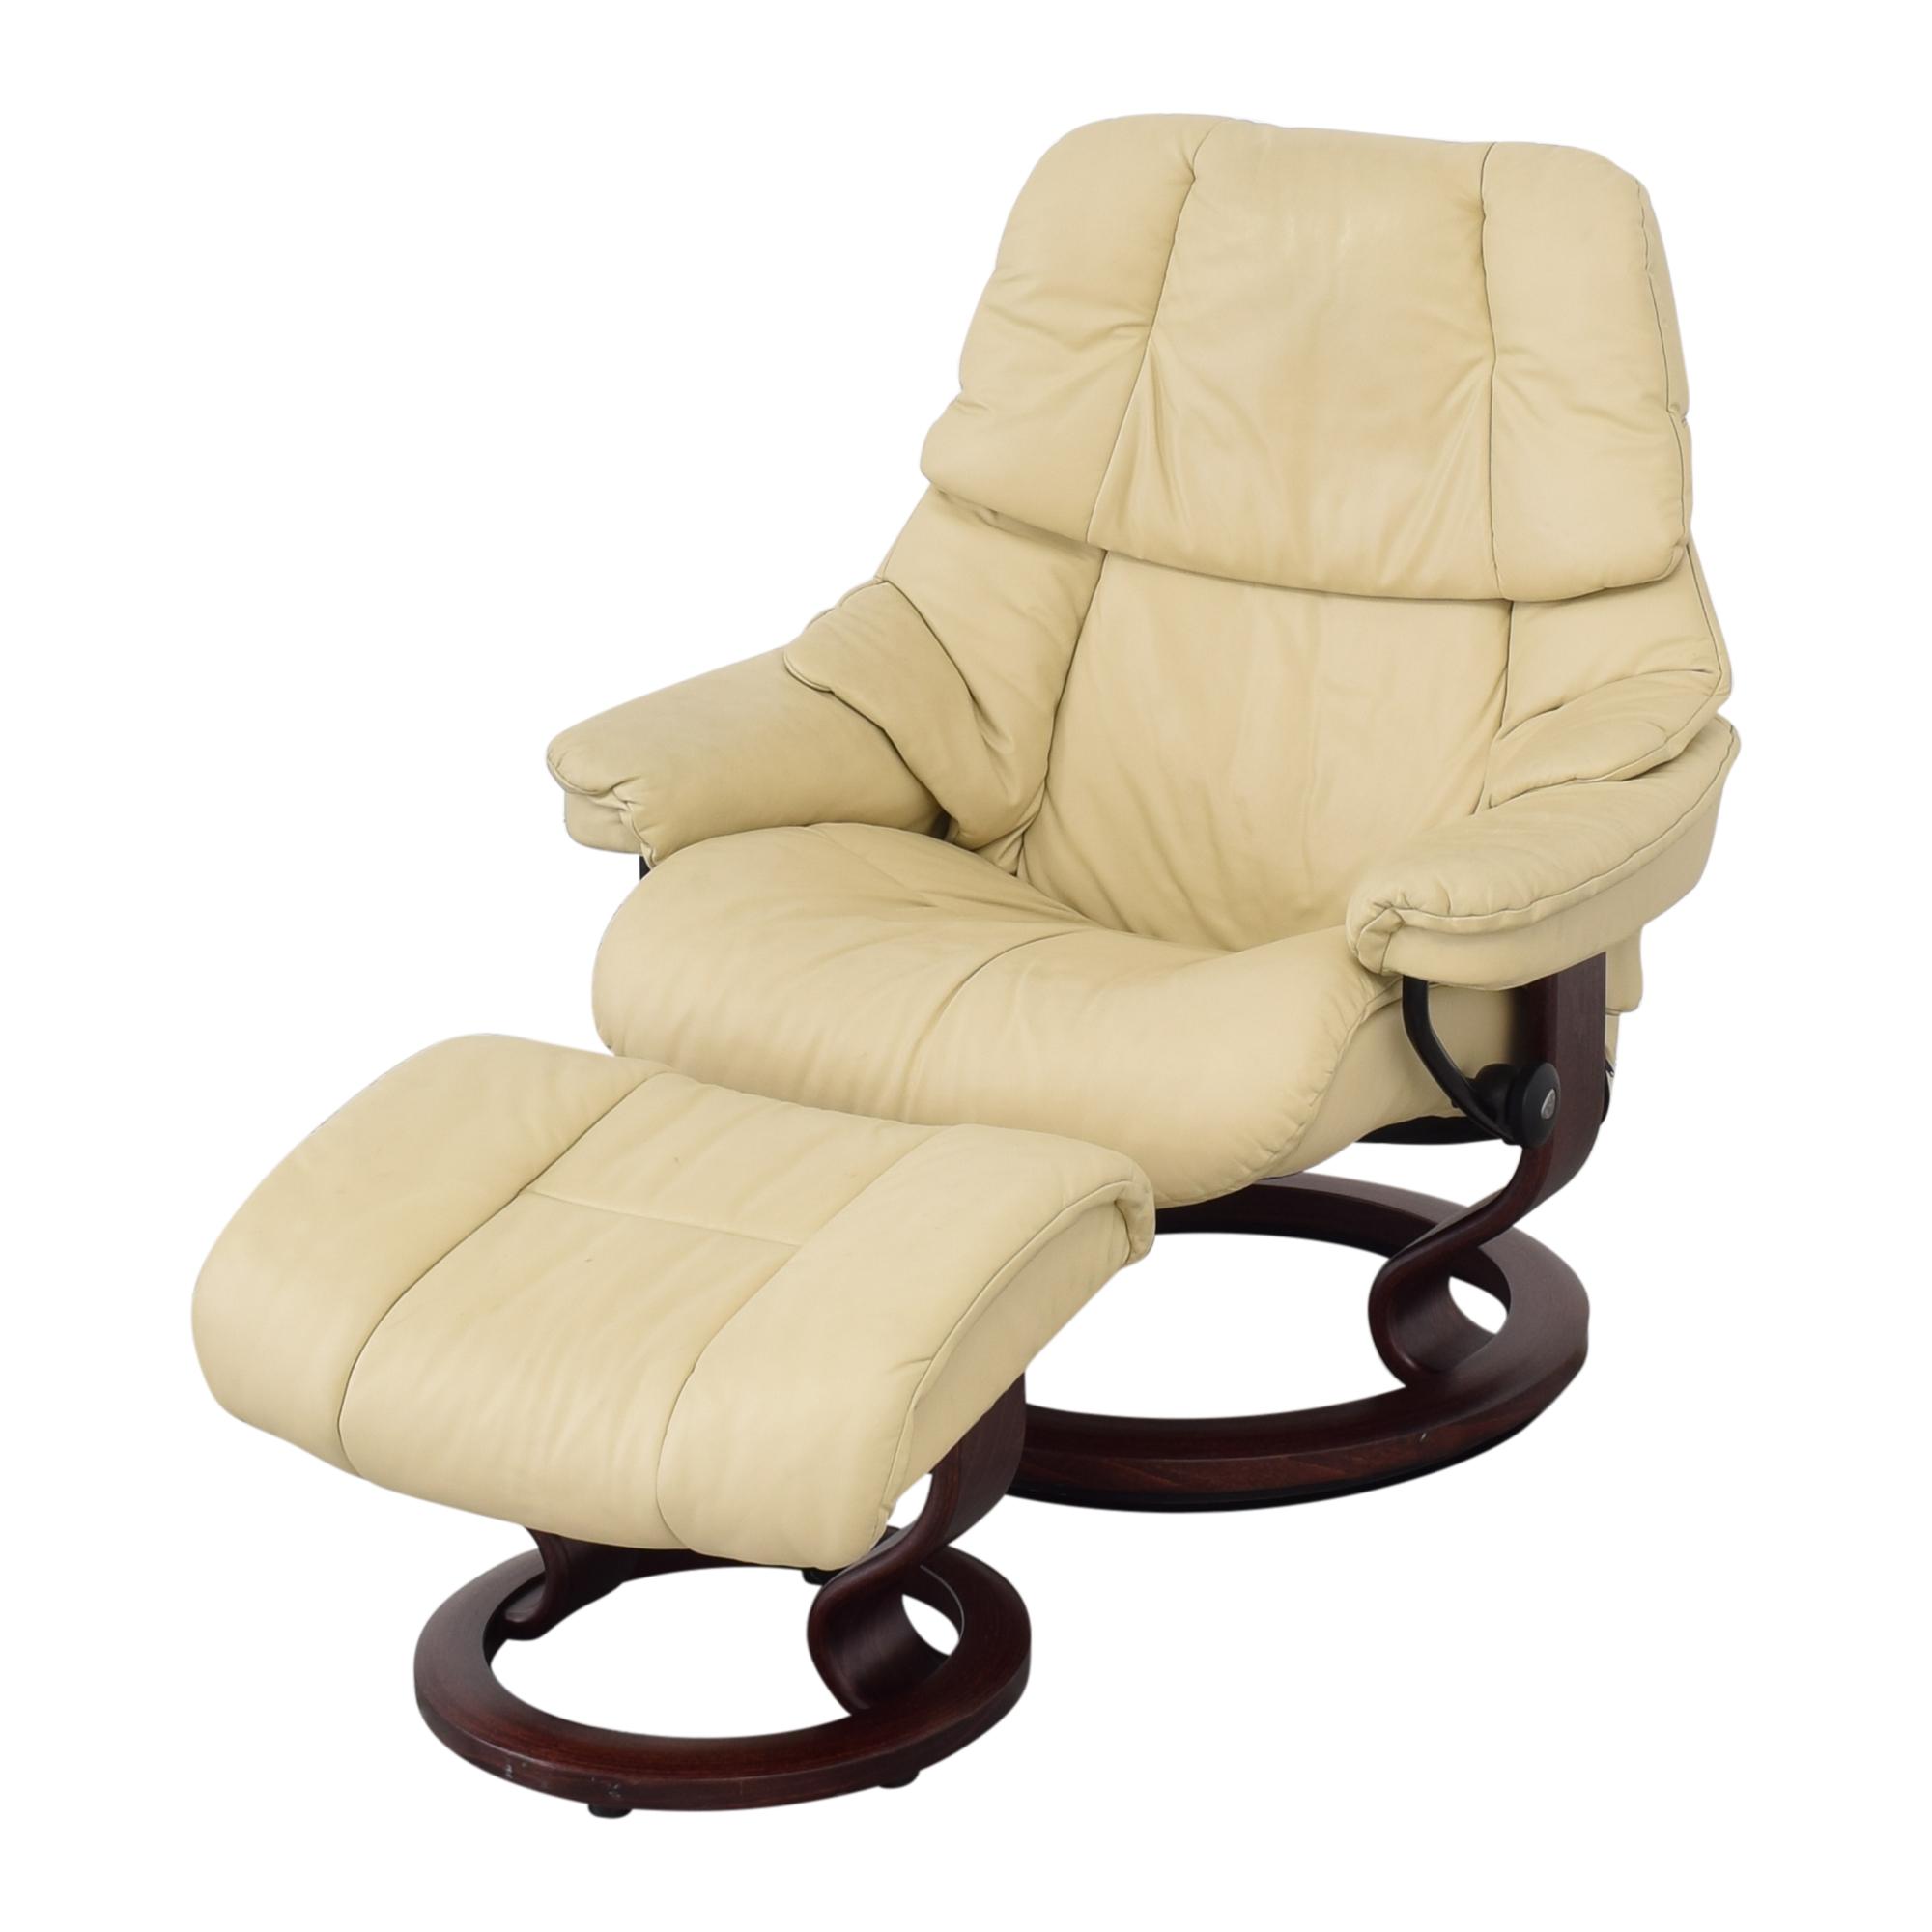 Ekornes Ekornes Large Recliner and Footrest Chairs